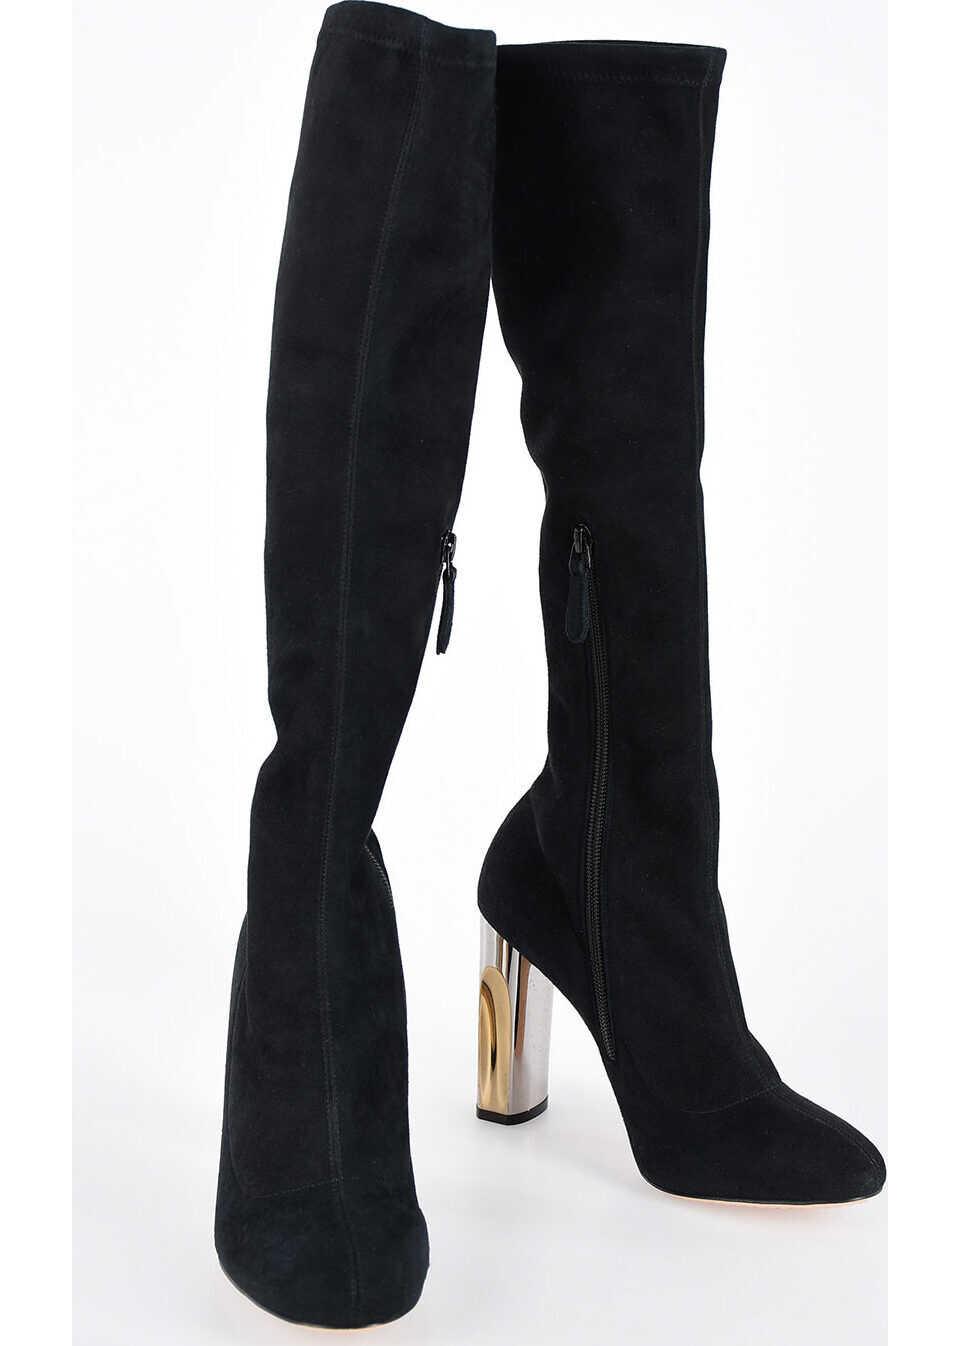 Alexander McQueen 10cm Suede Leather Boots BLACK